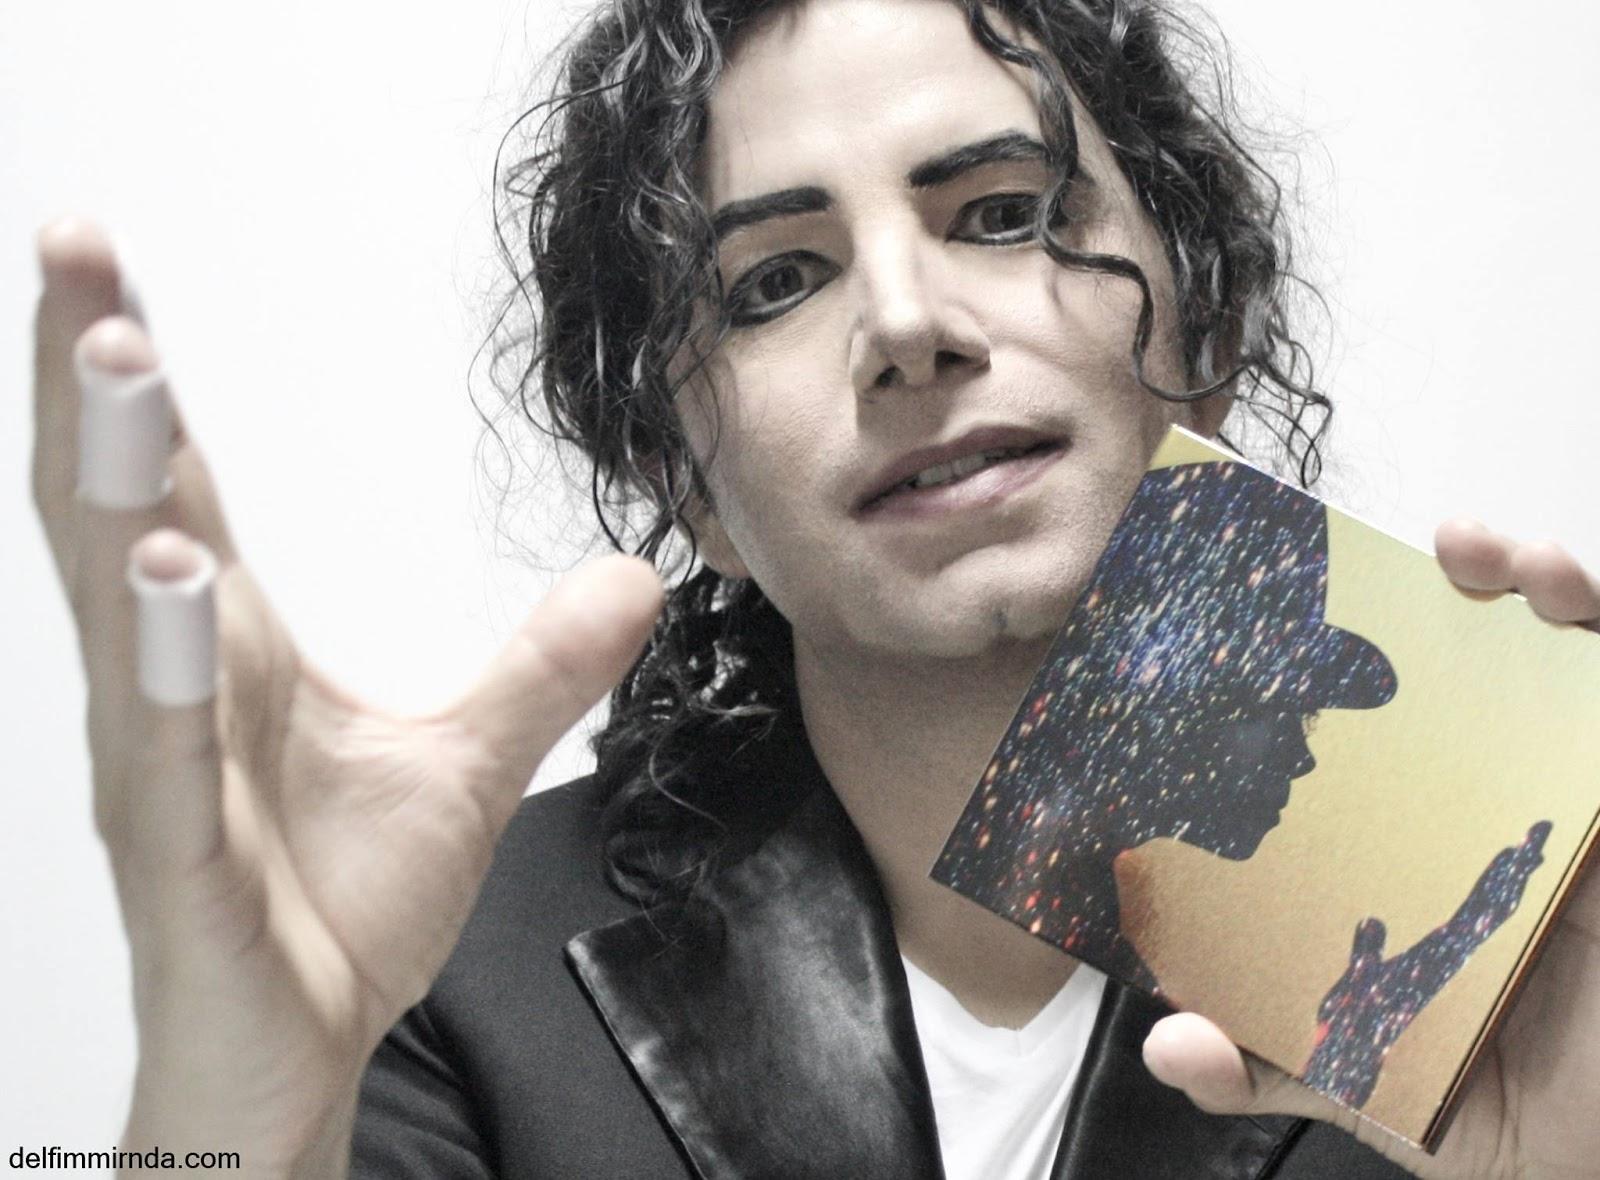 Delfim Miranda - Michael Jackson Tribute - Xscape Gold back